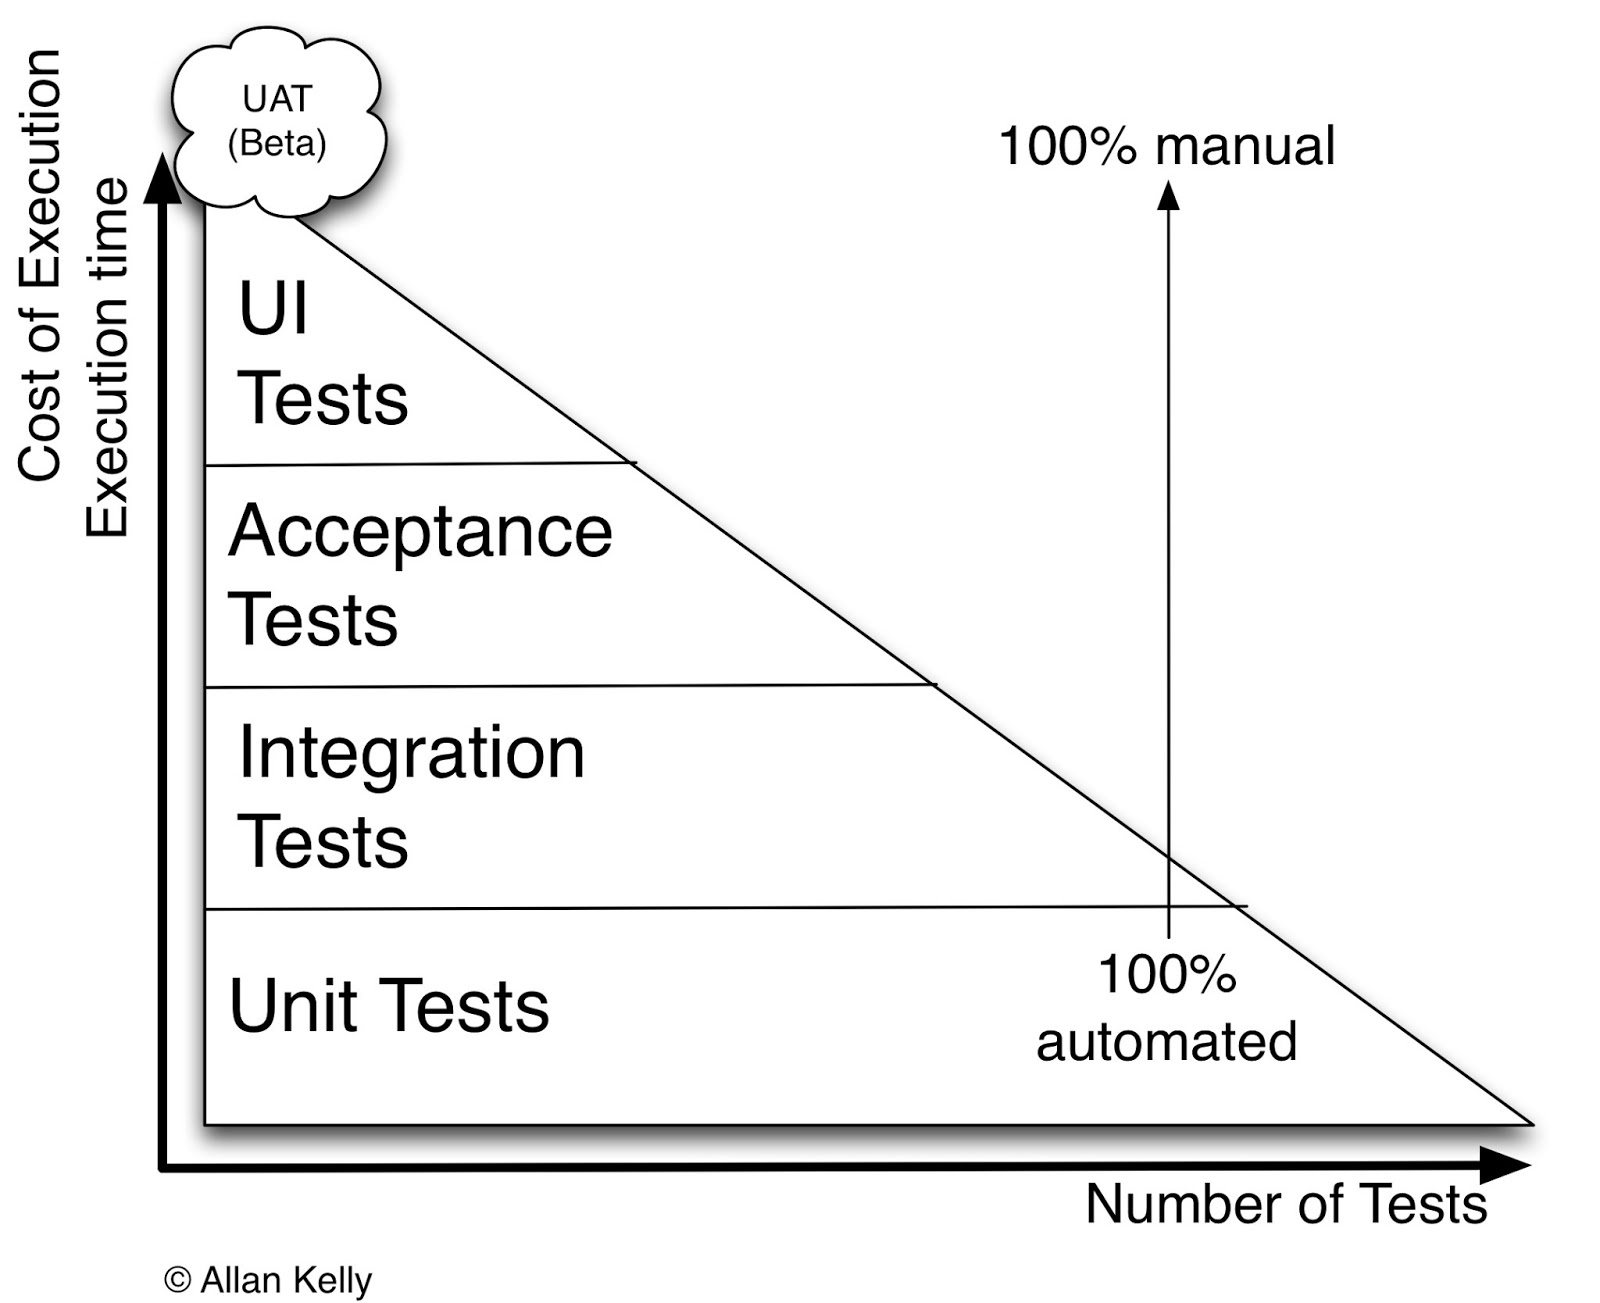 Unit testing with zunit http1bpspot rqltptssyouz9cyqzflqiaaaaaaaaayo9kix6agwsaus1600testingtrianglepishedg pooptronica Choice Image